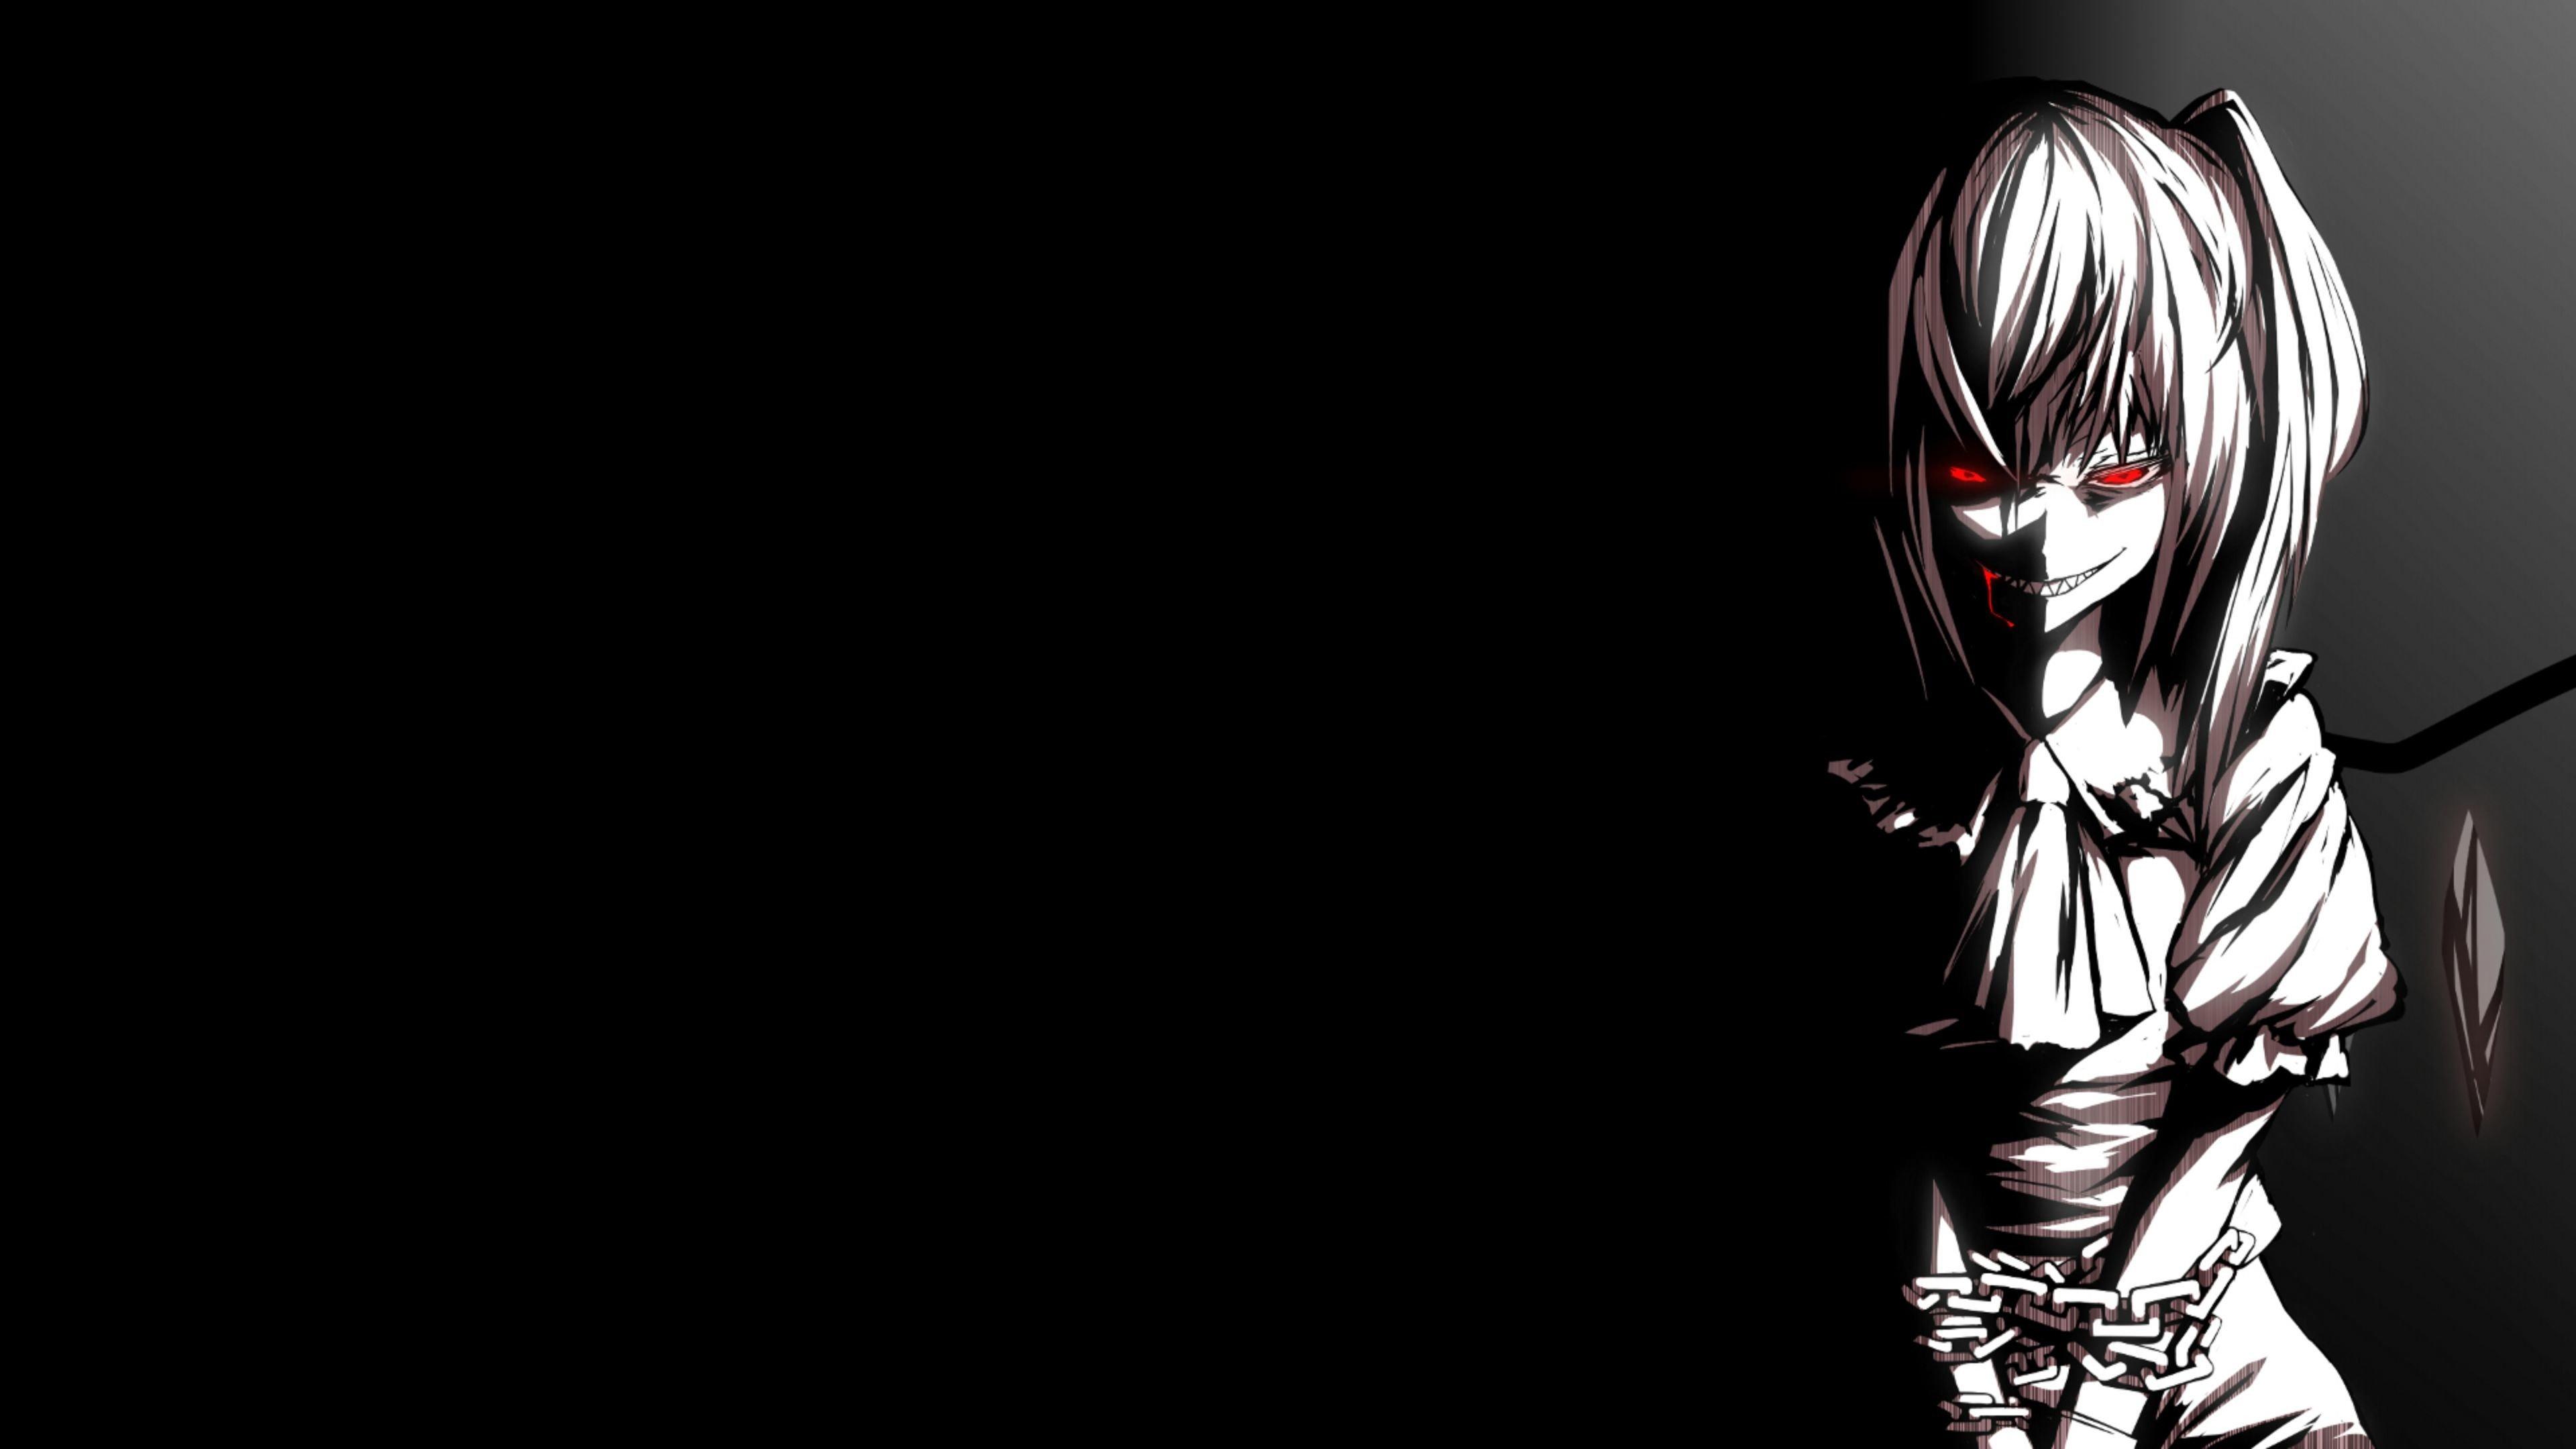 Wallpaper Anime Black 4k 3840x2160